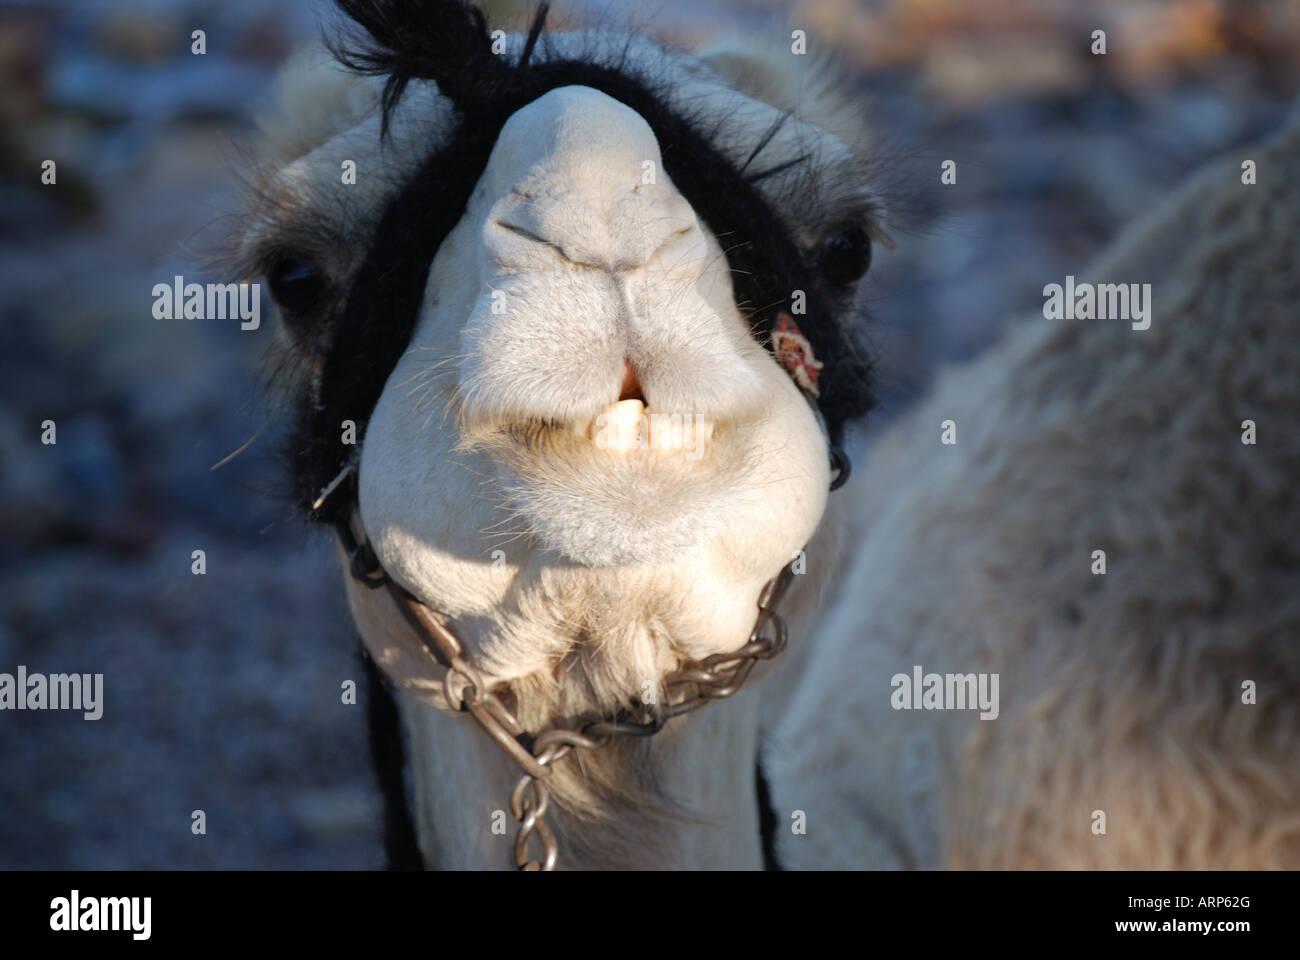 Close-up of camel's face, Nuweiba, Sinai Peninsula, Republic of Egypt - Stock Image